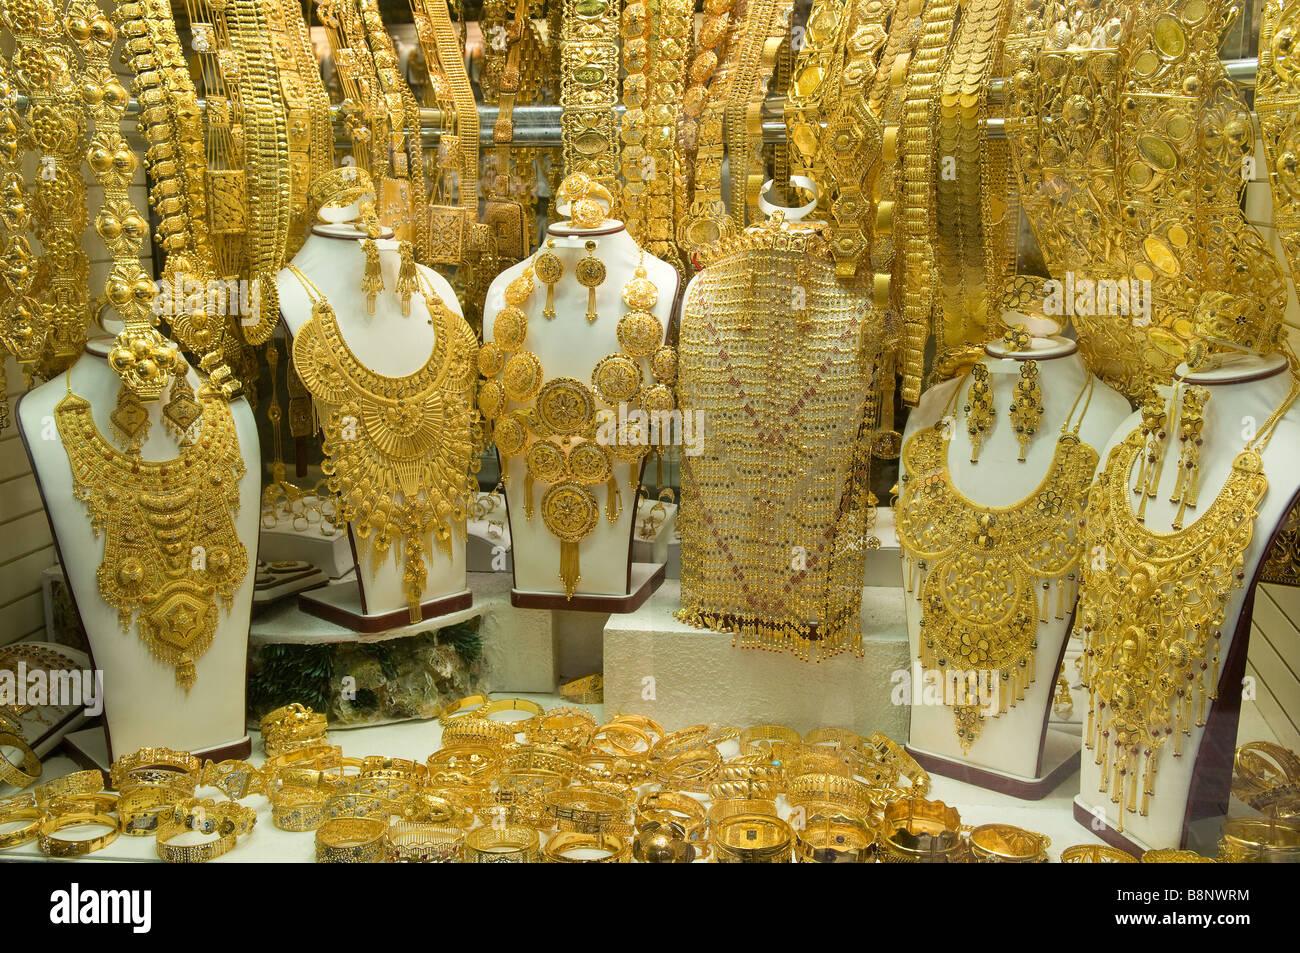 gold souk, dubai, uae - Stock Image